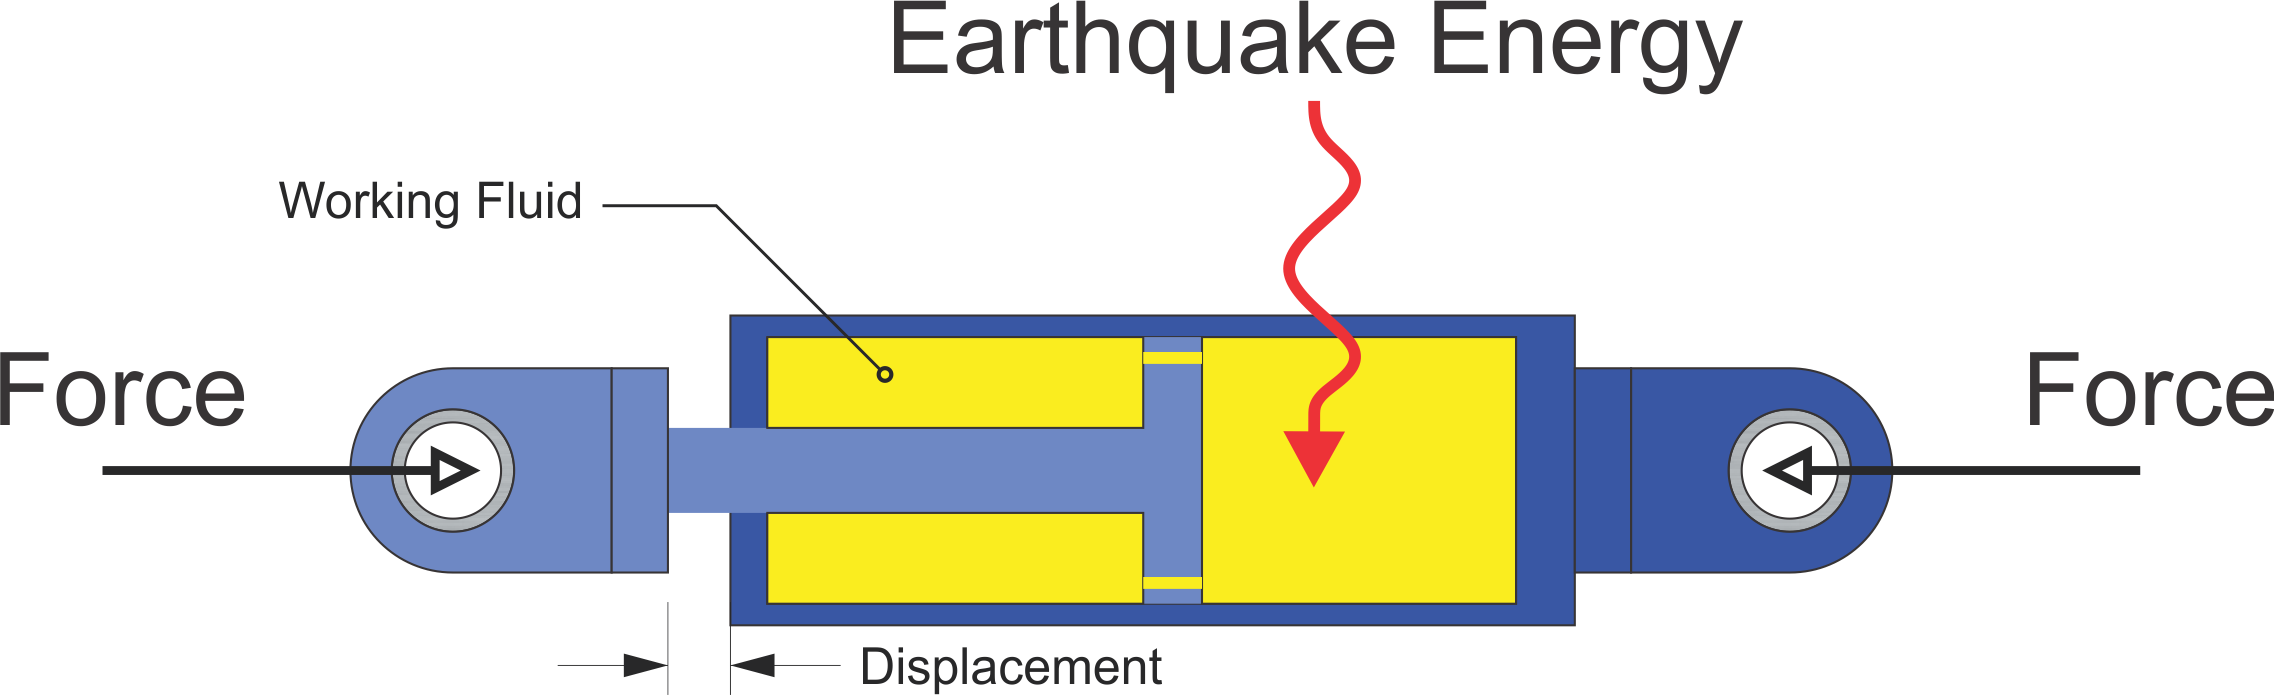 Seismic Viscous Damper